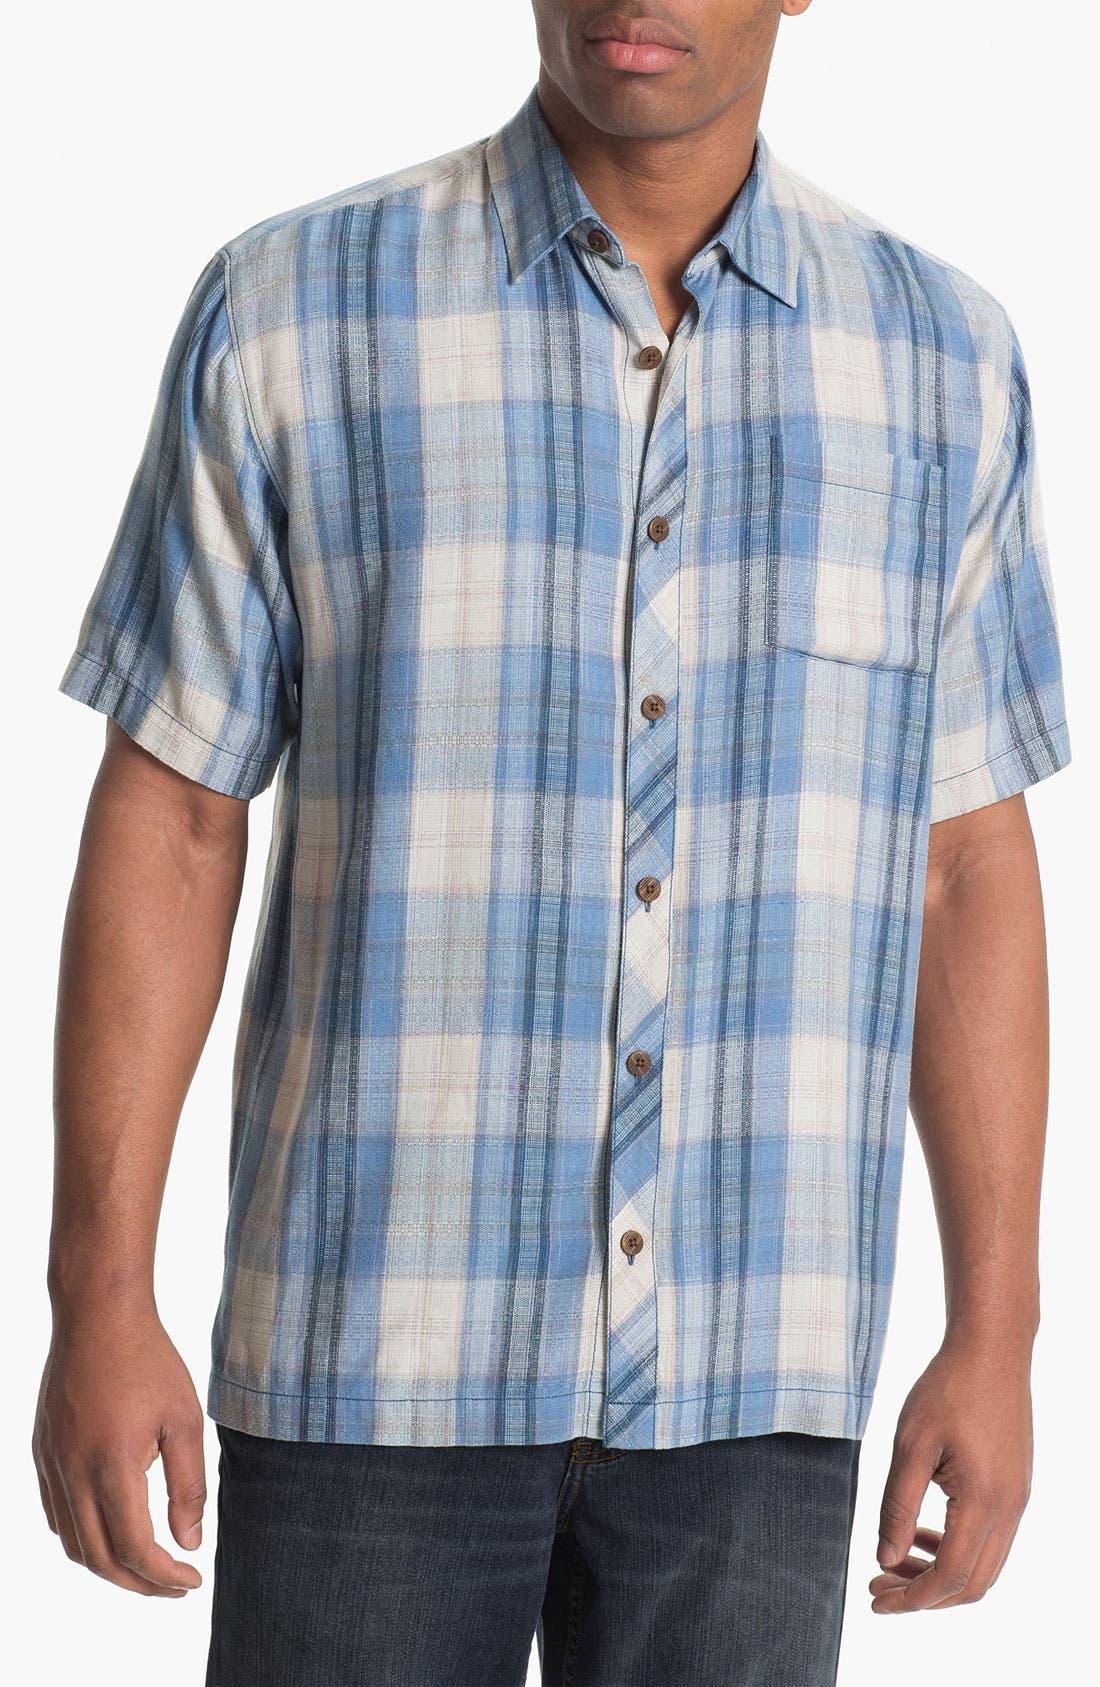 Alternate Image 1 Selected - Tommy Bahama 'Seaside Plaid' Silk Campshirt (Big & Tall)